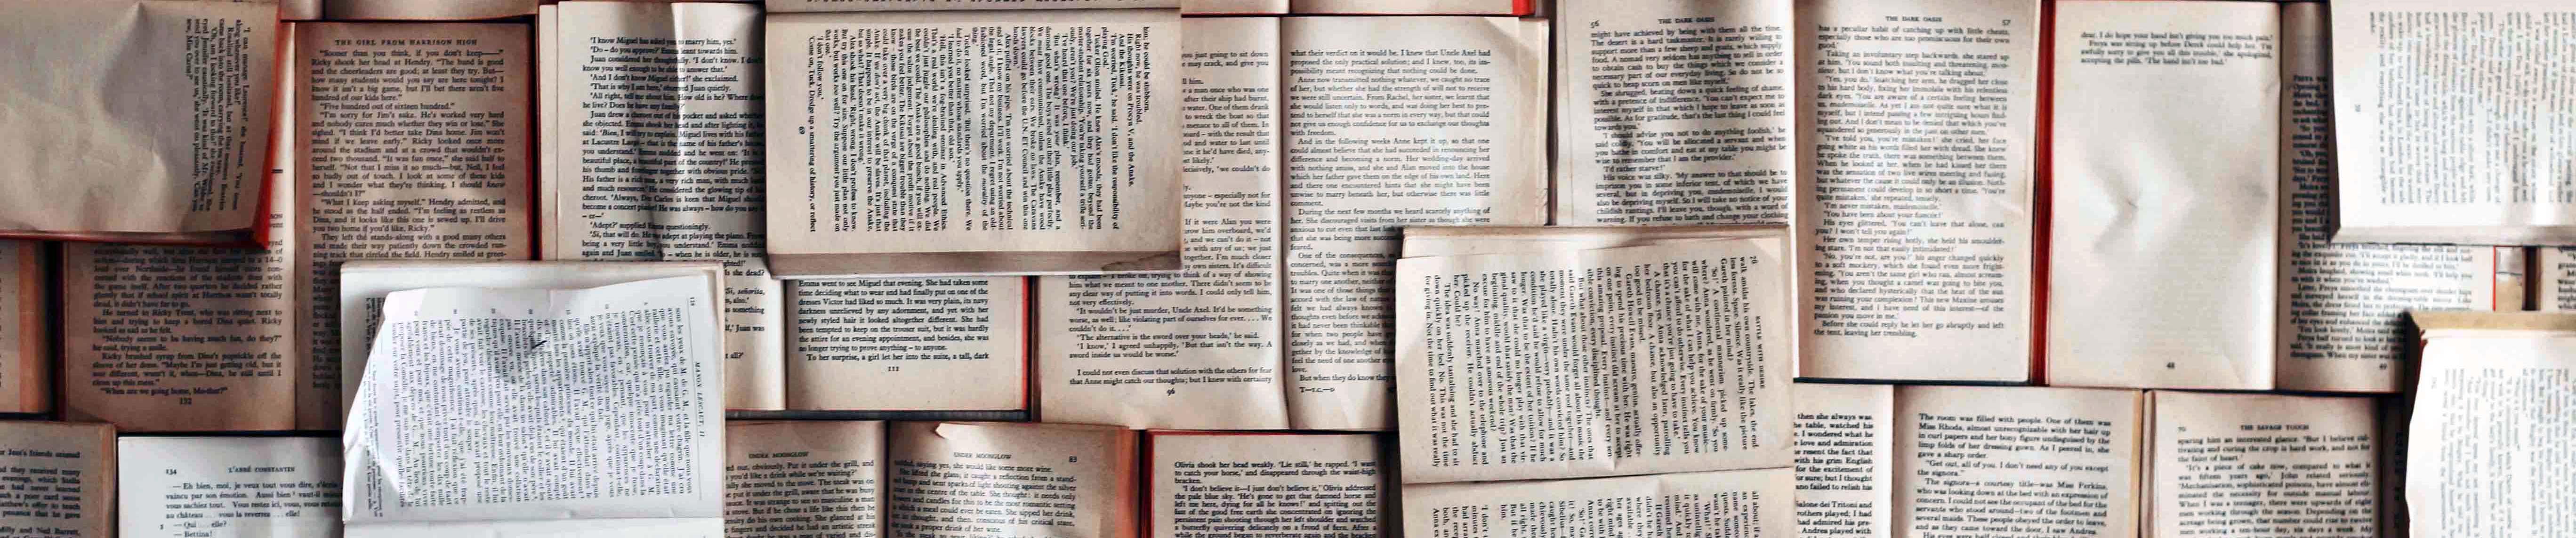 content-writing-seo-copywriting-writer